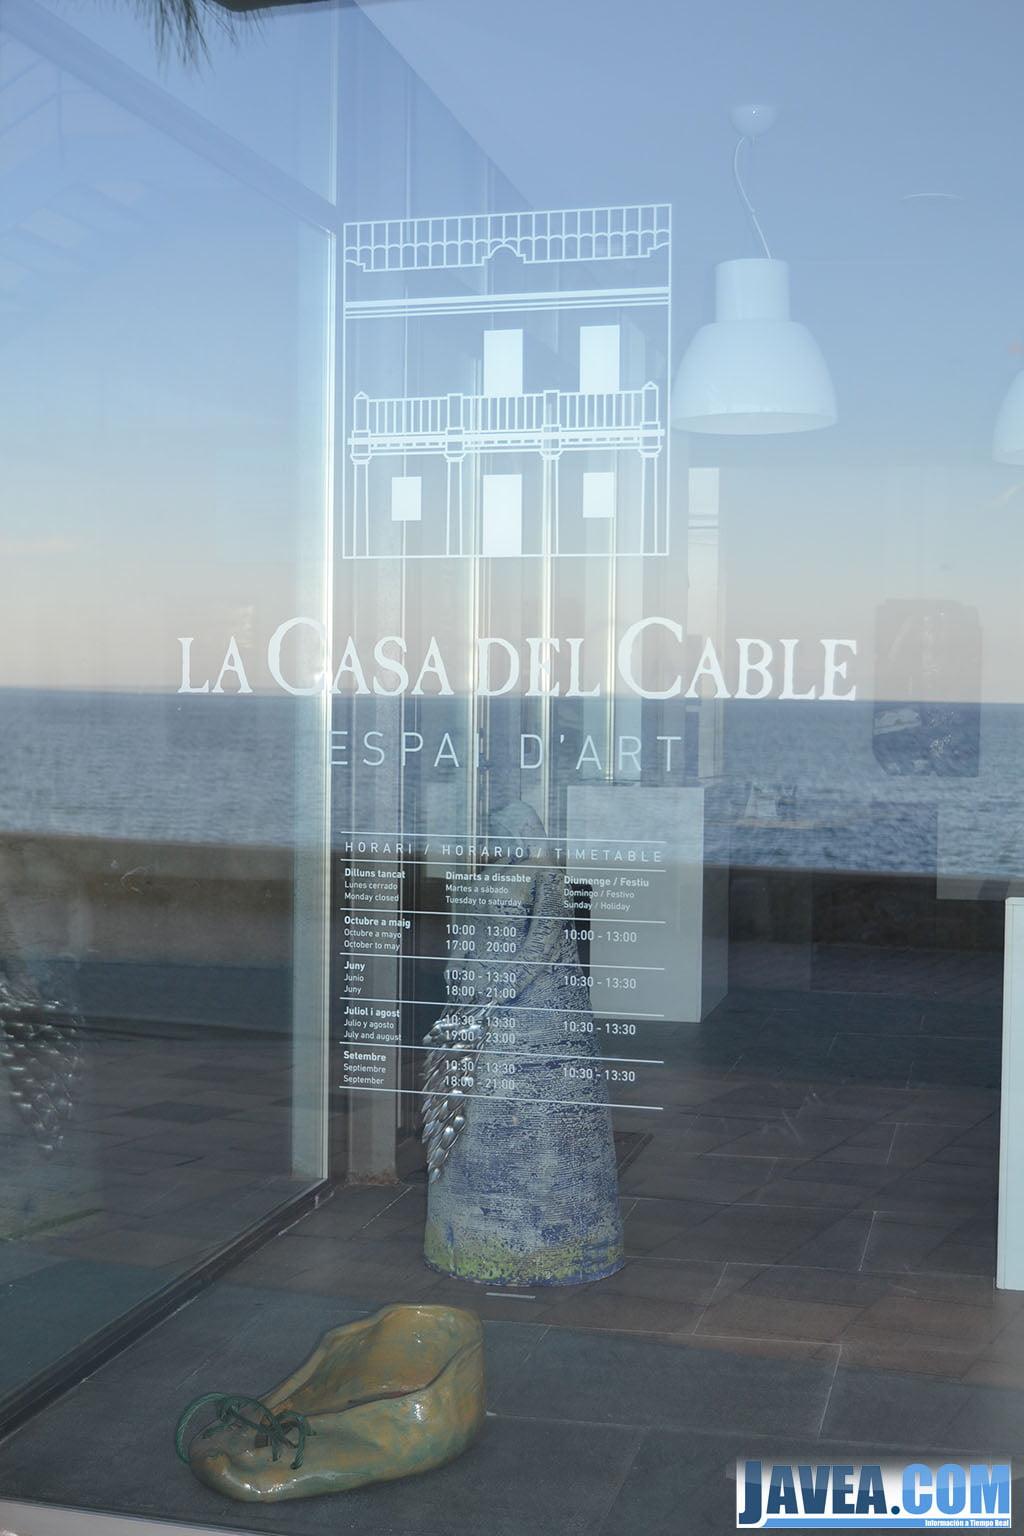 La Casa del Cable en el Paseo Marina Española de Jávea a primera línea de la Playa La Grava